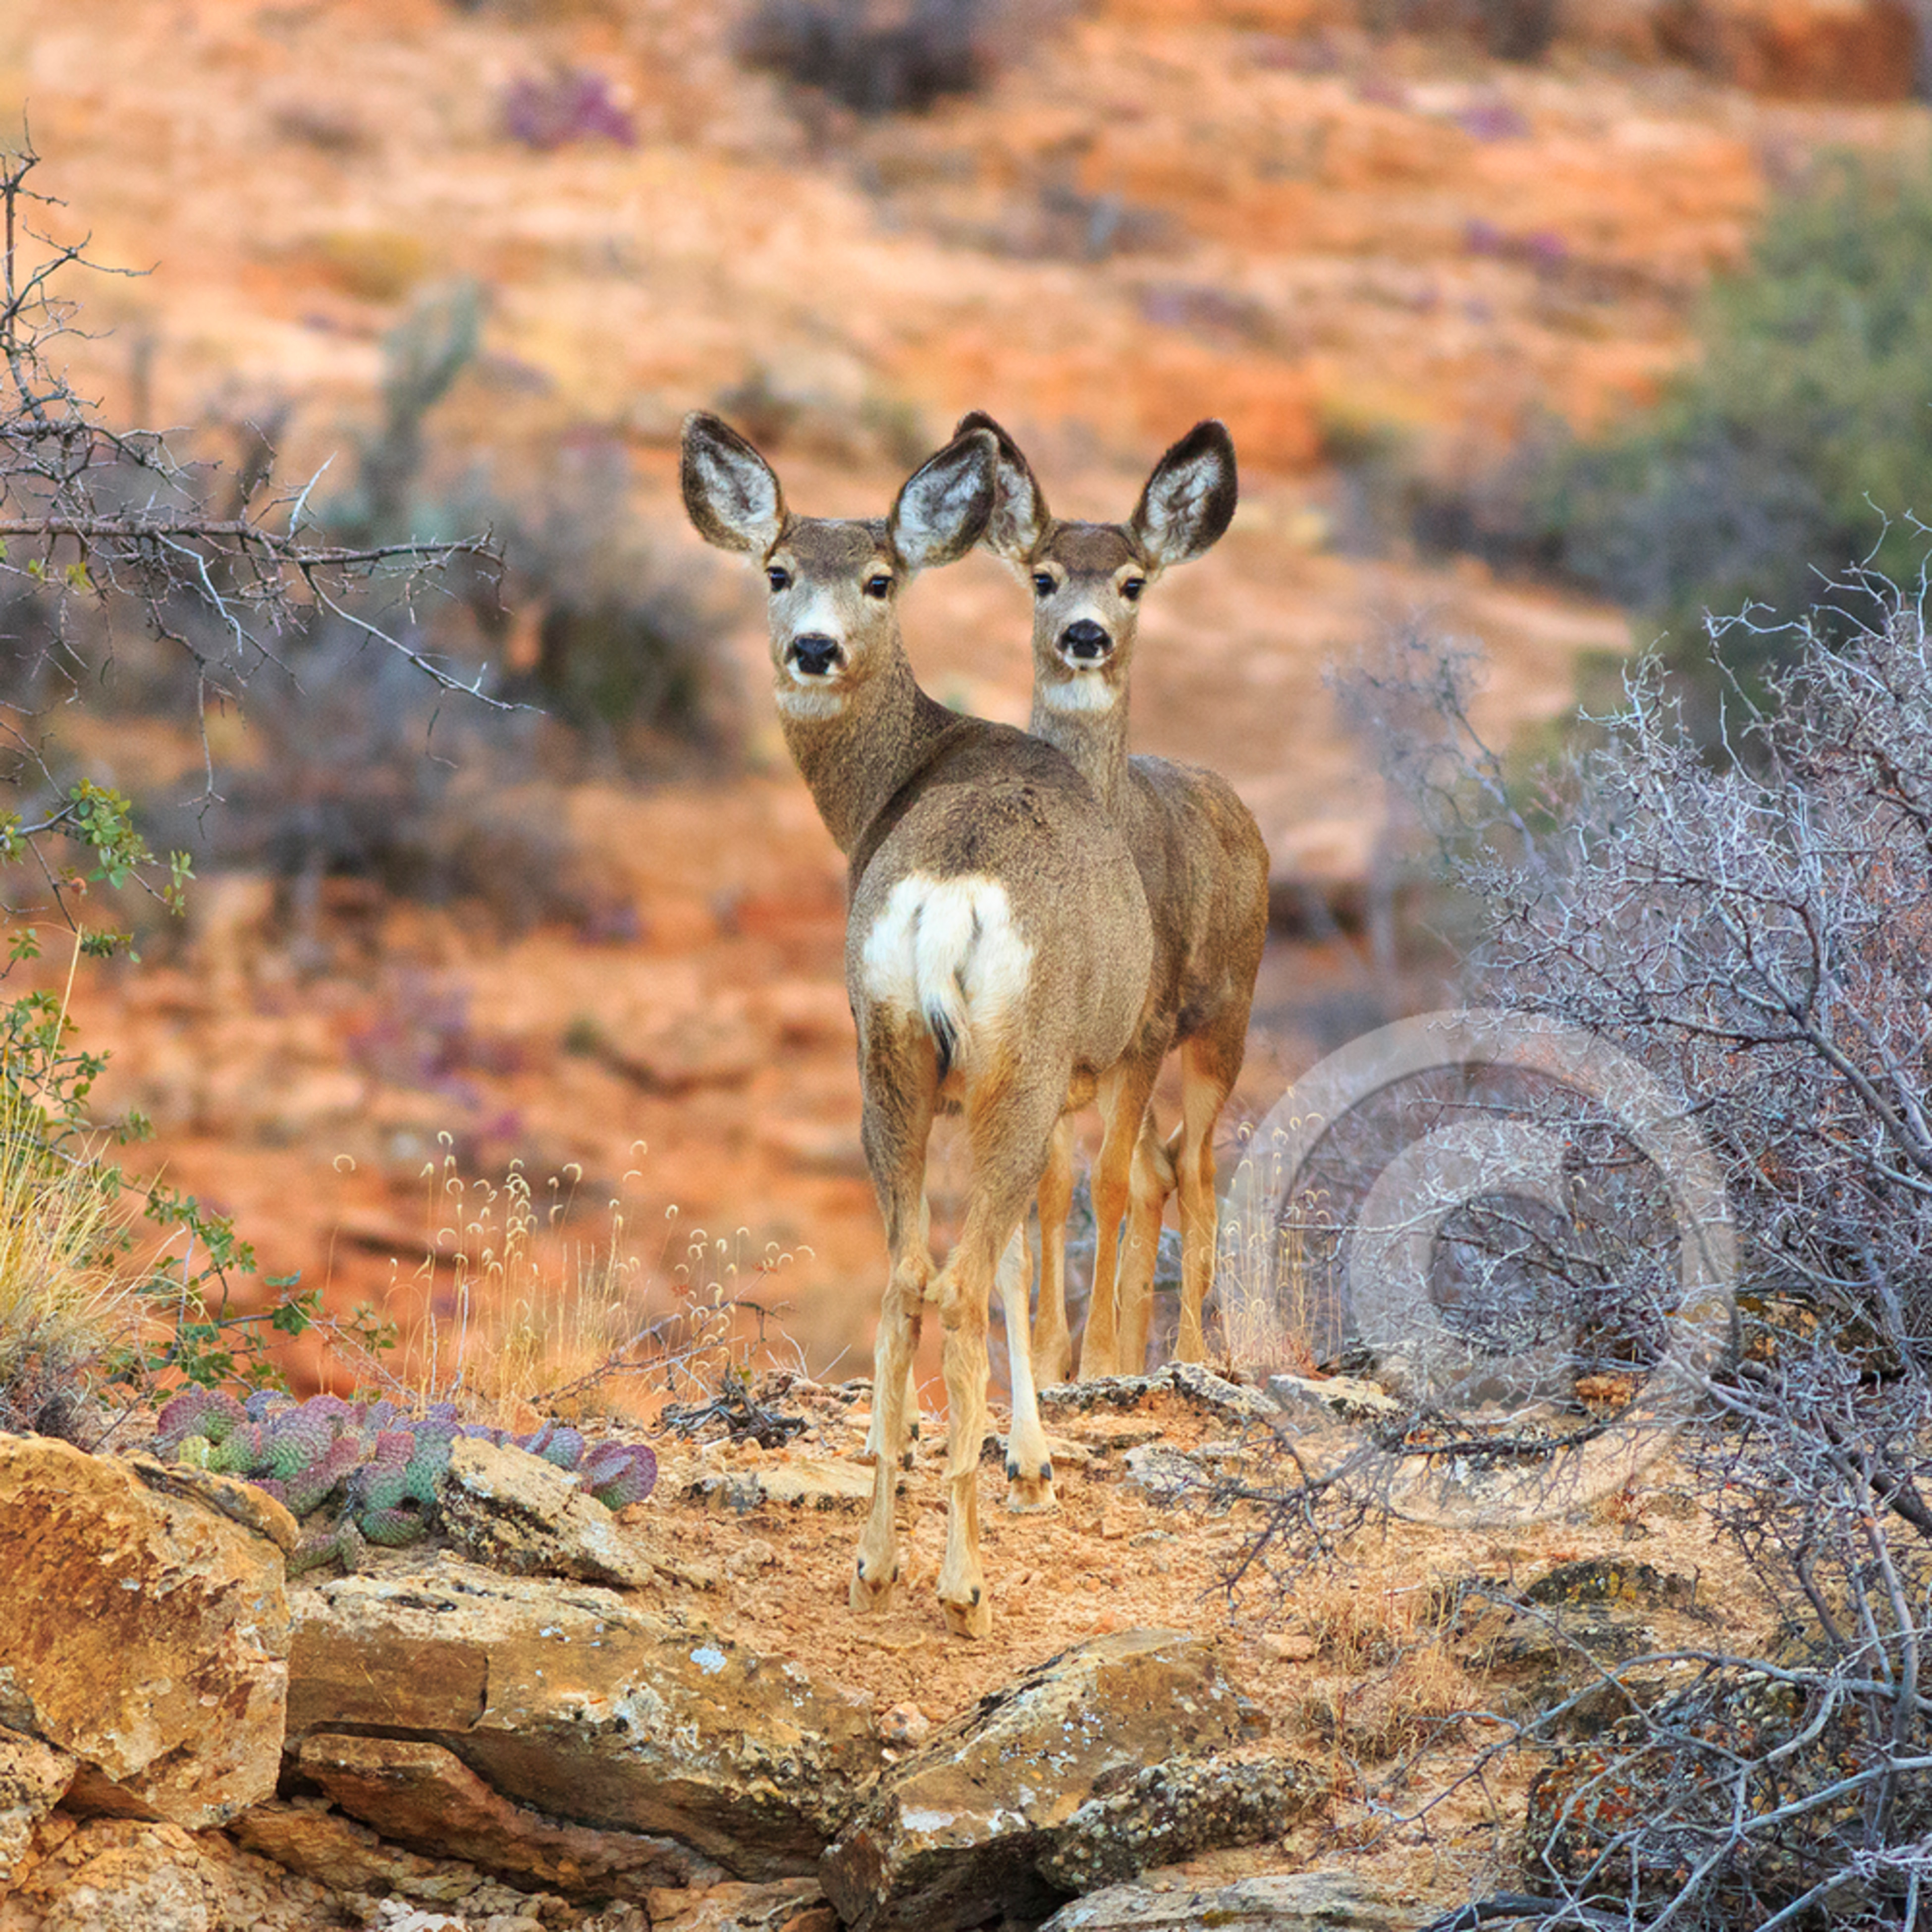 Mj20131119 6621 moccasin mule deer q413ot